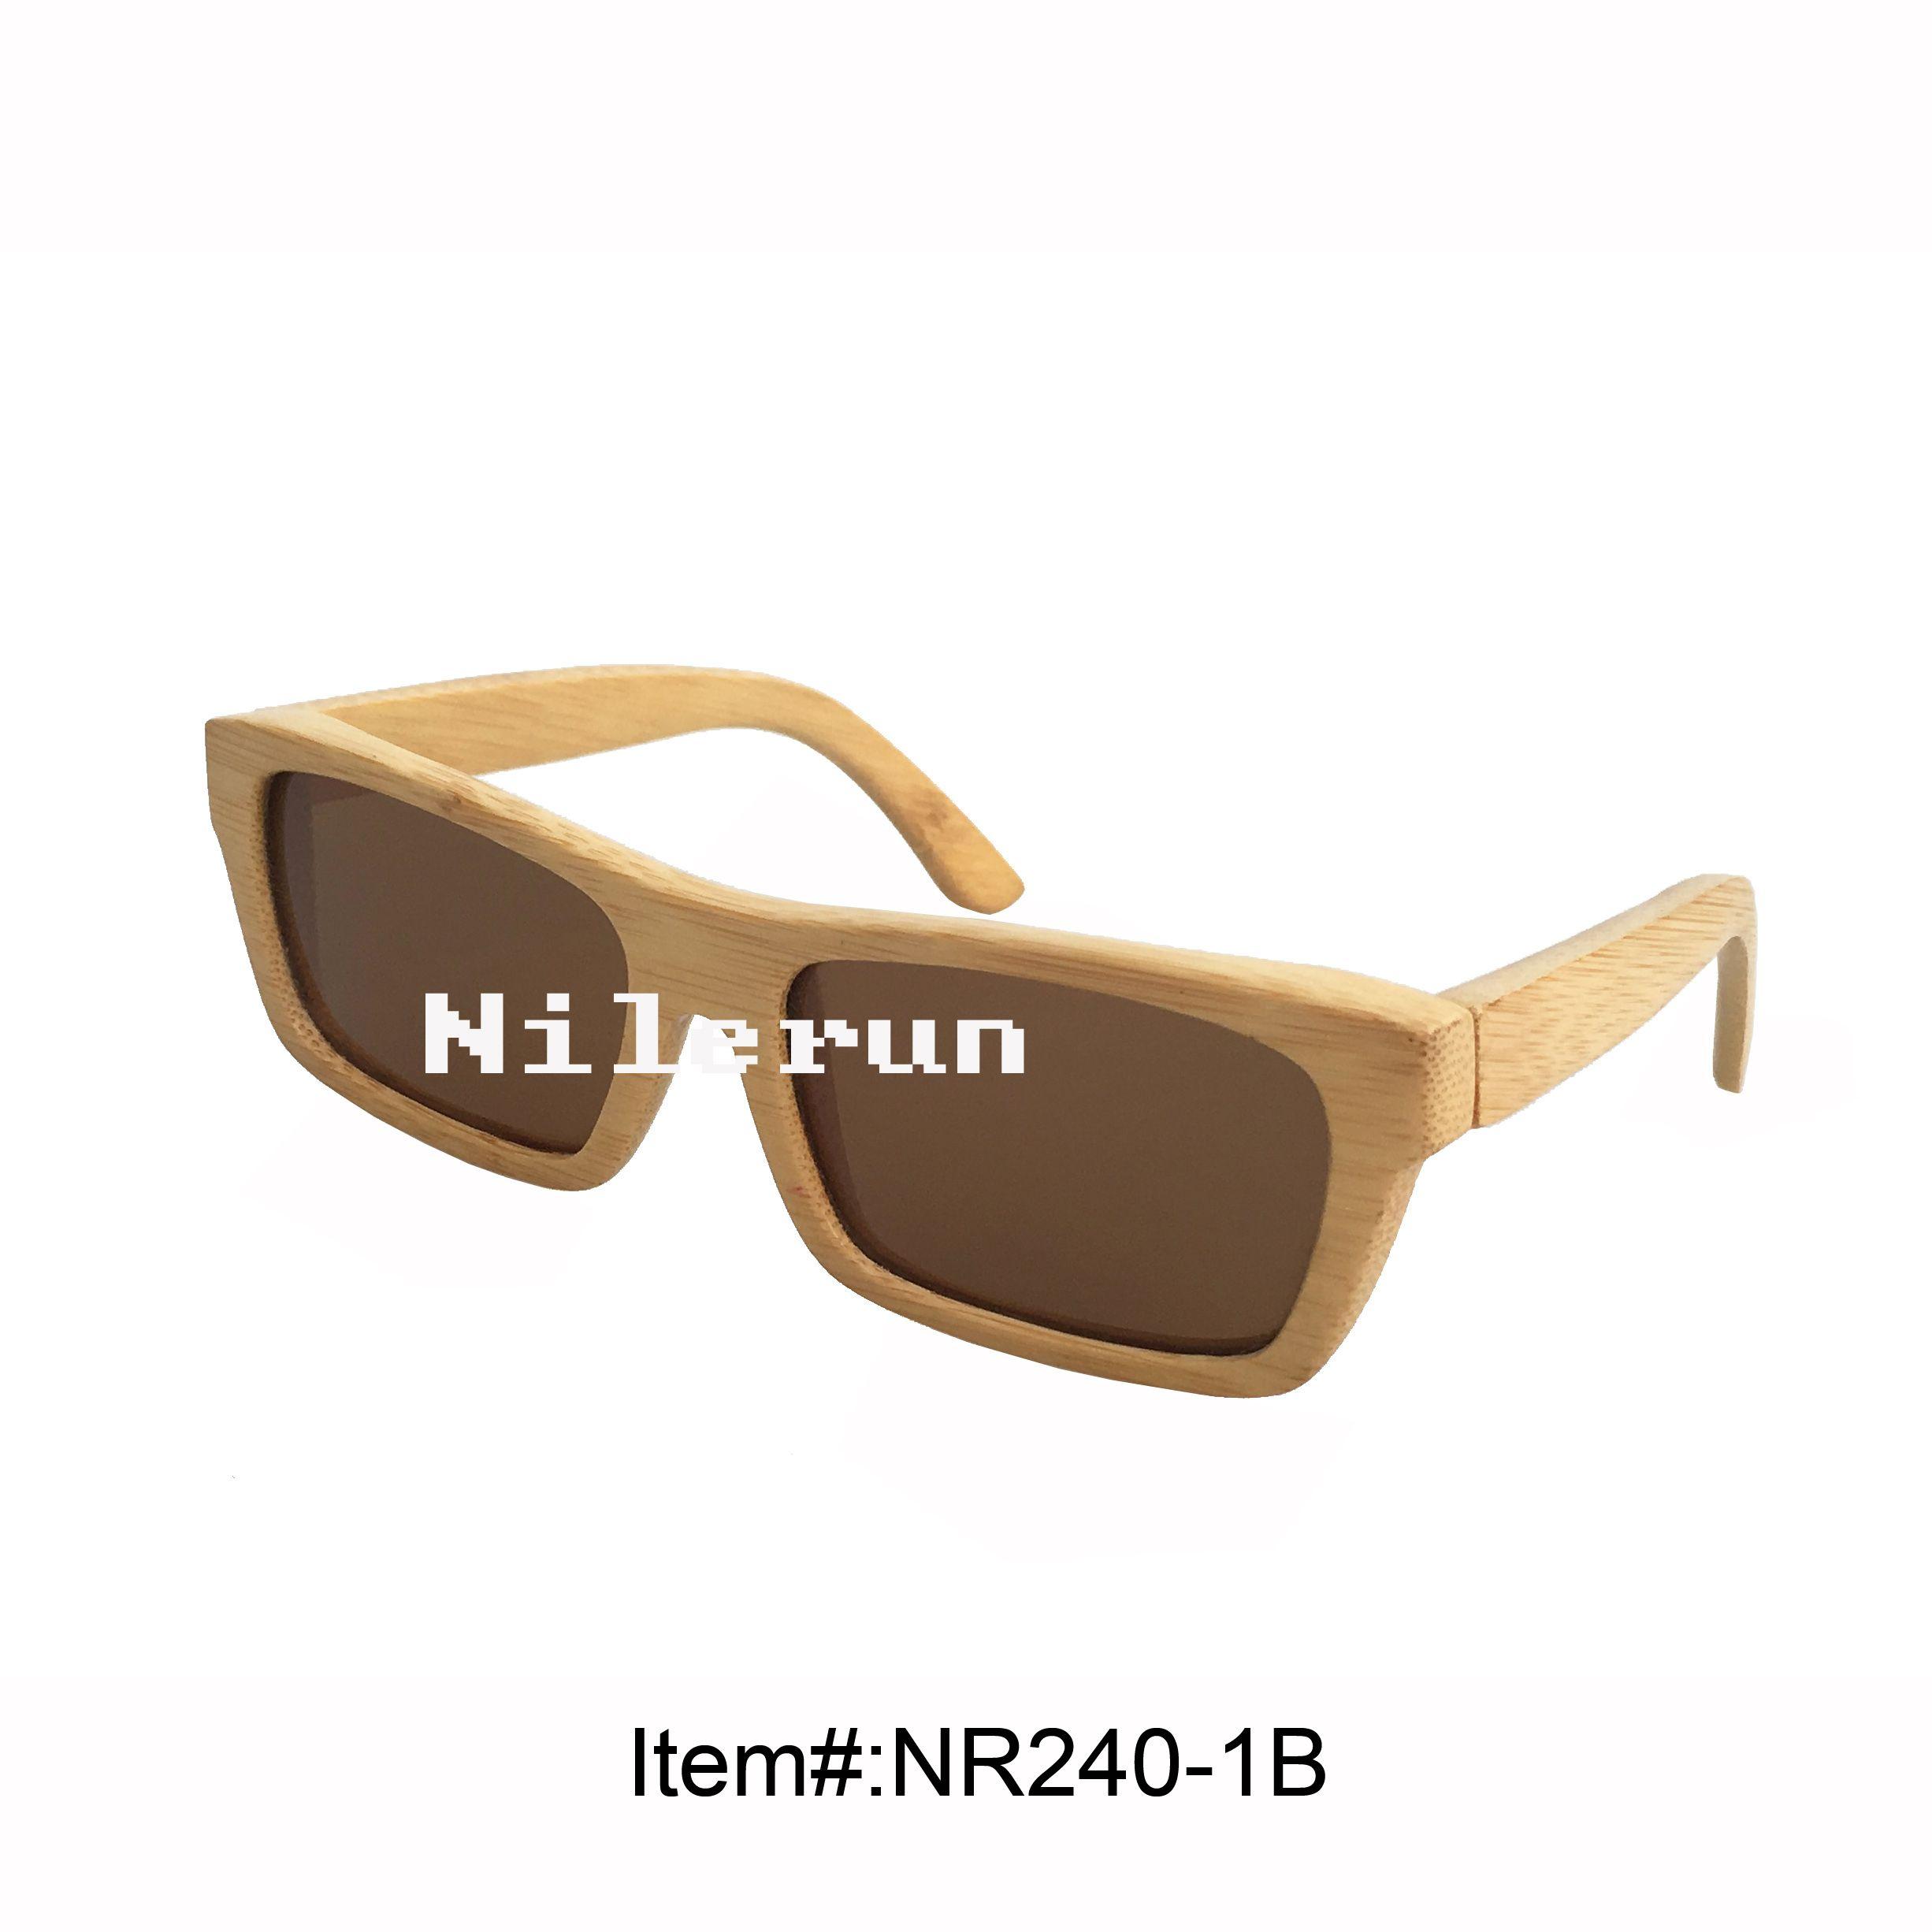 a157aa6e19252 Rectangle Natural Real Bamboo Frame Sunglasses With UV400 Polarized Brown  Lens Prescription Glasses Sunglass From Nilerun